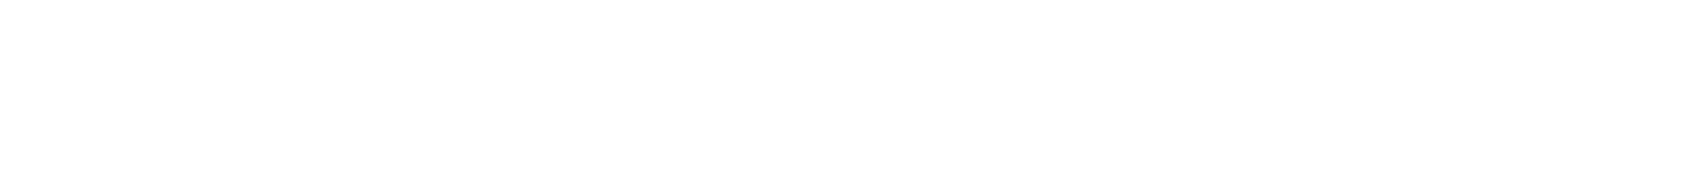 nordlaks_logo_tittel_negativ.png